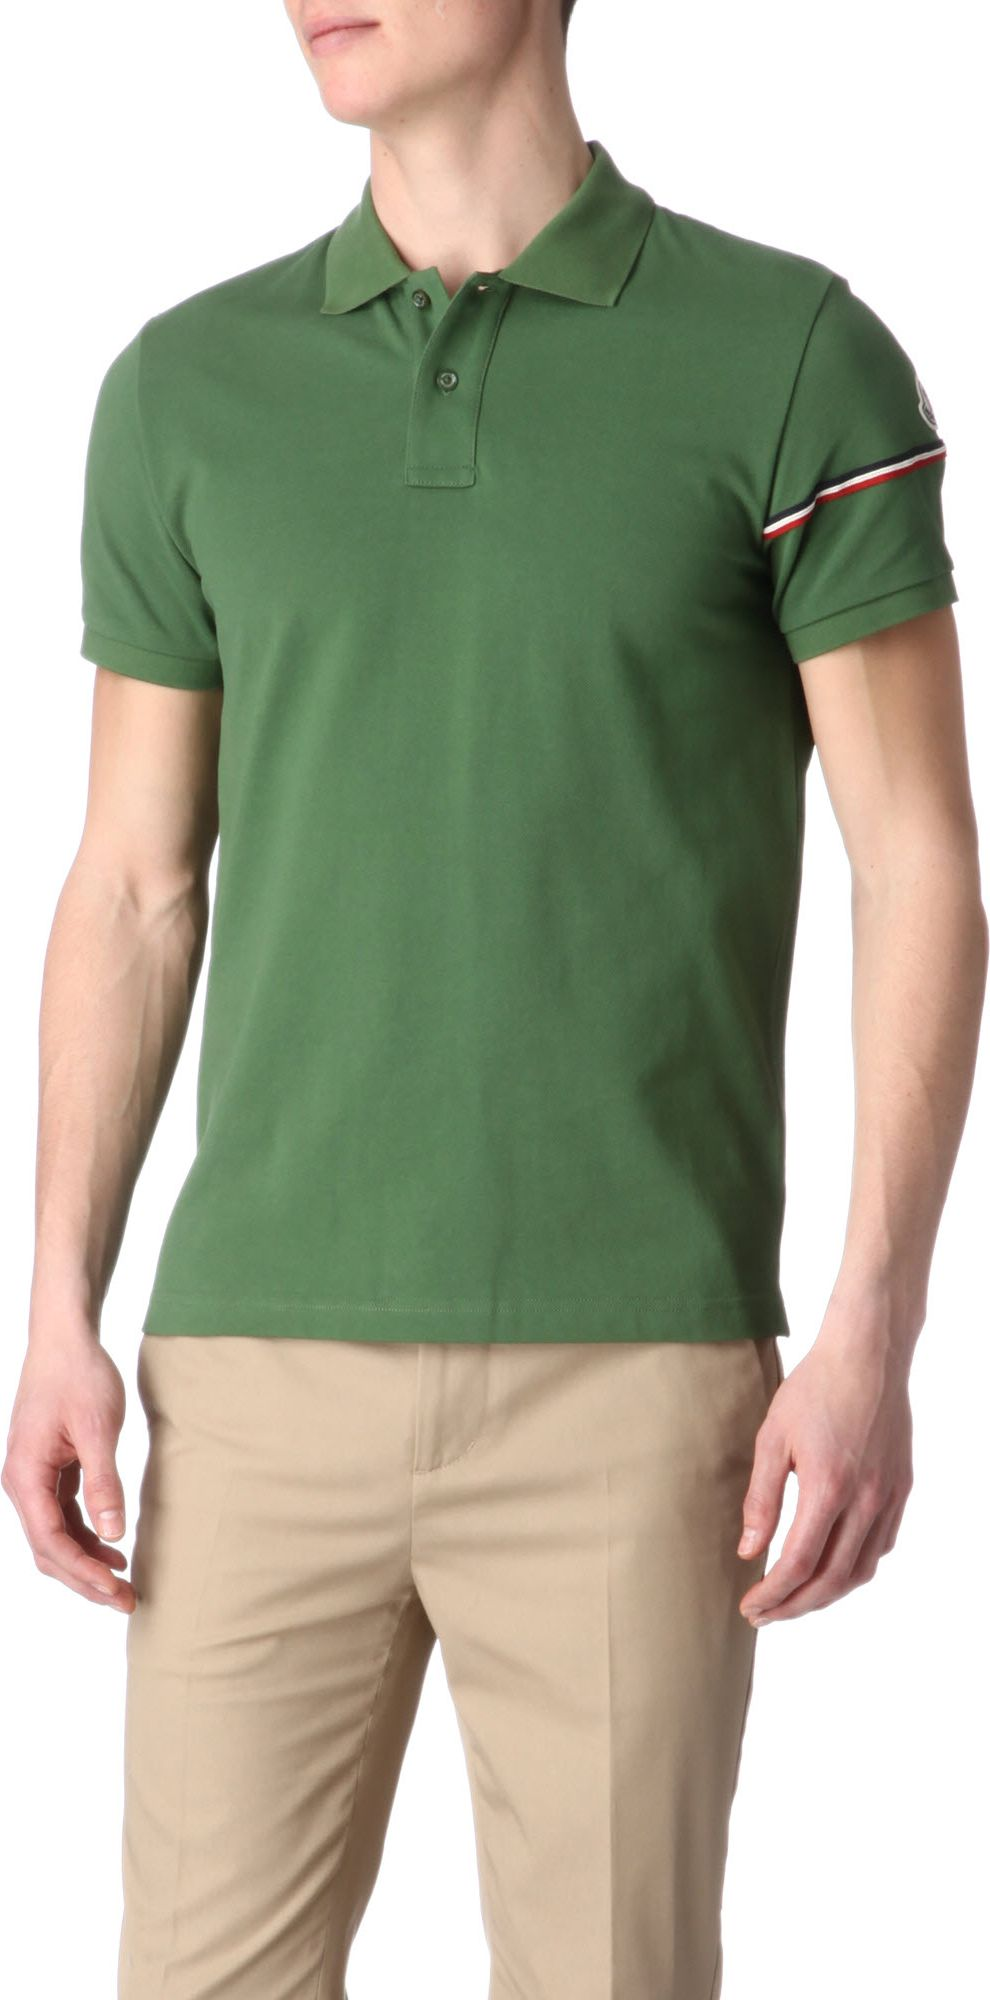 Moncler Stripedarm Polo Shirt In Green For Men Lyst